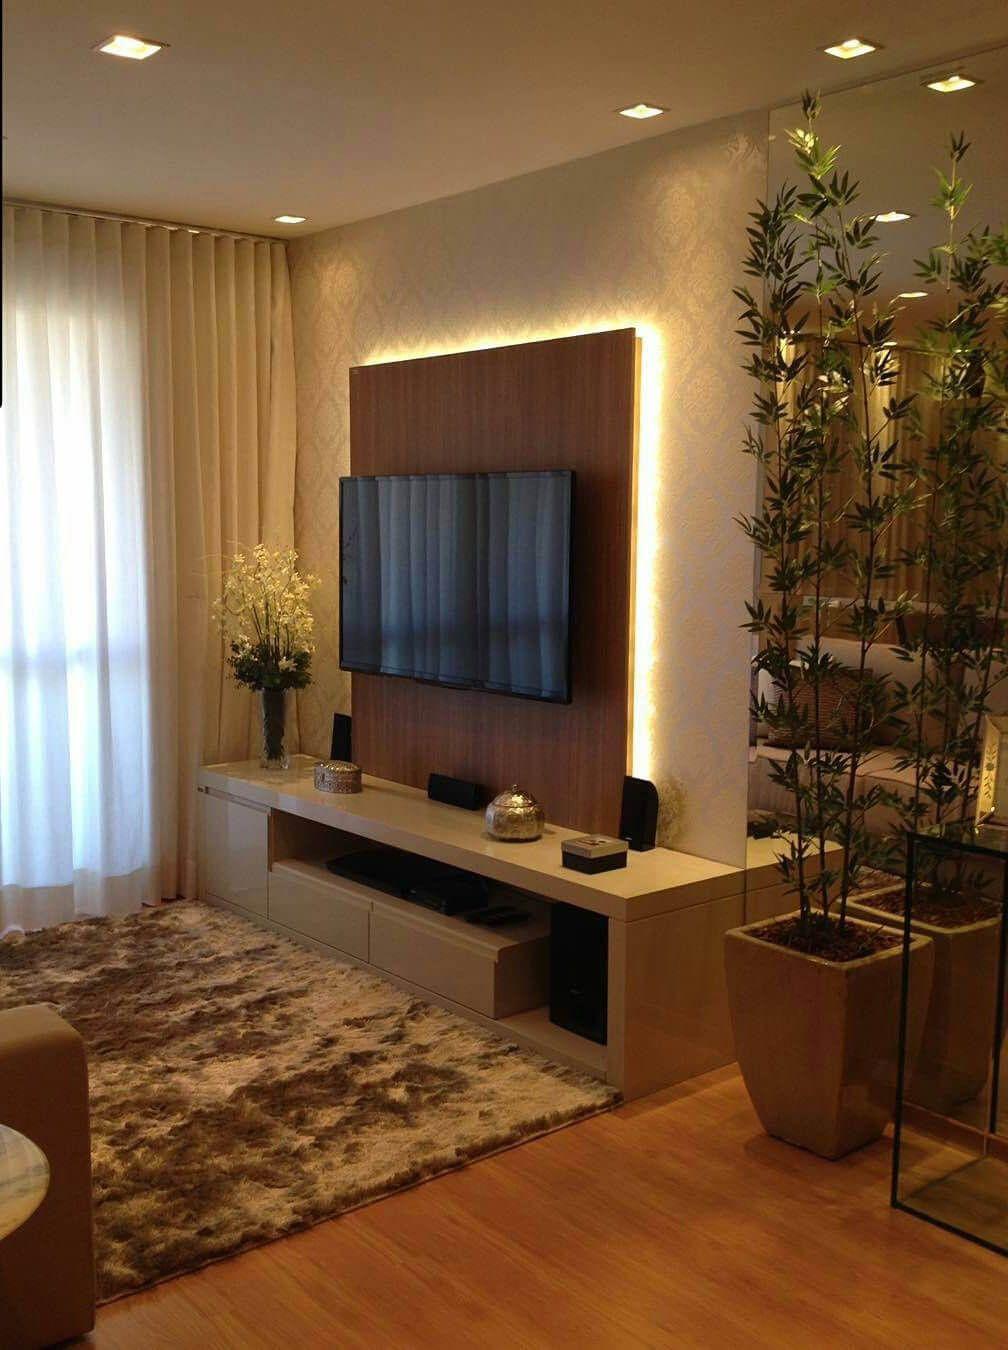 Popular Interior Design For Tv Showcase: Unique Mount For The TV Stand